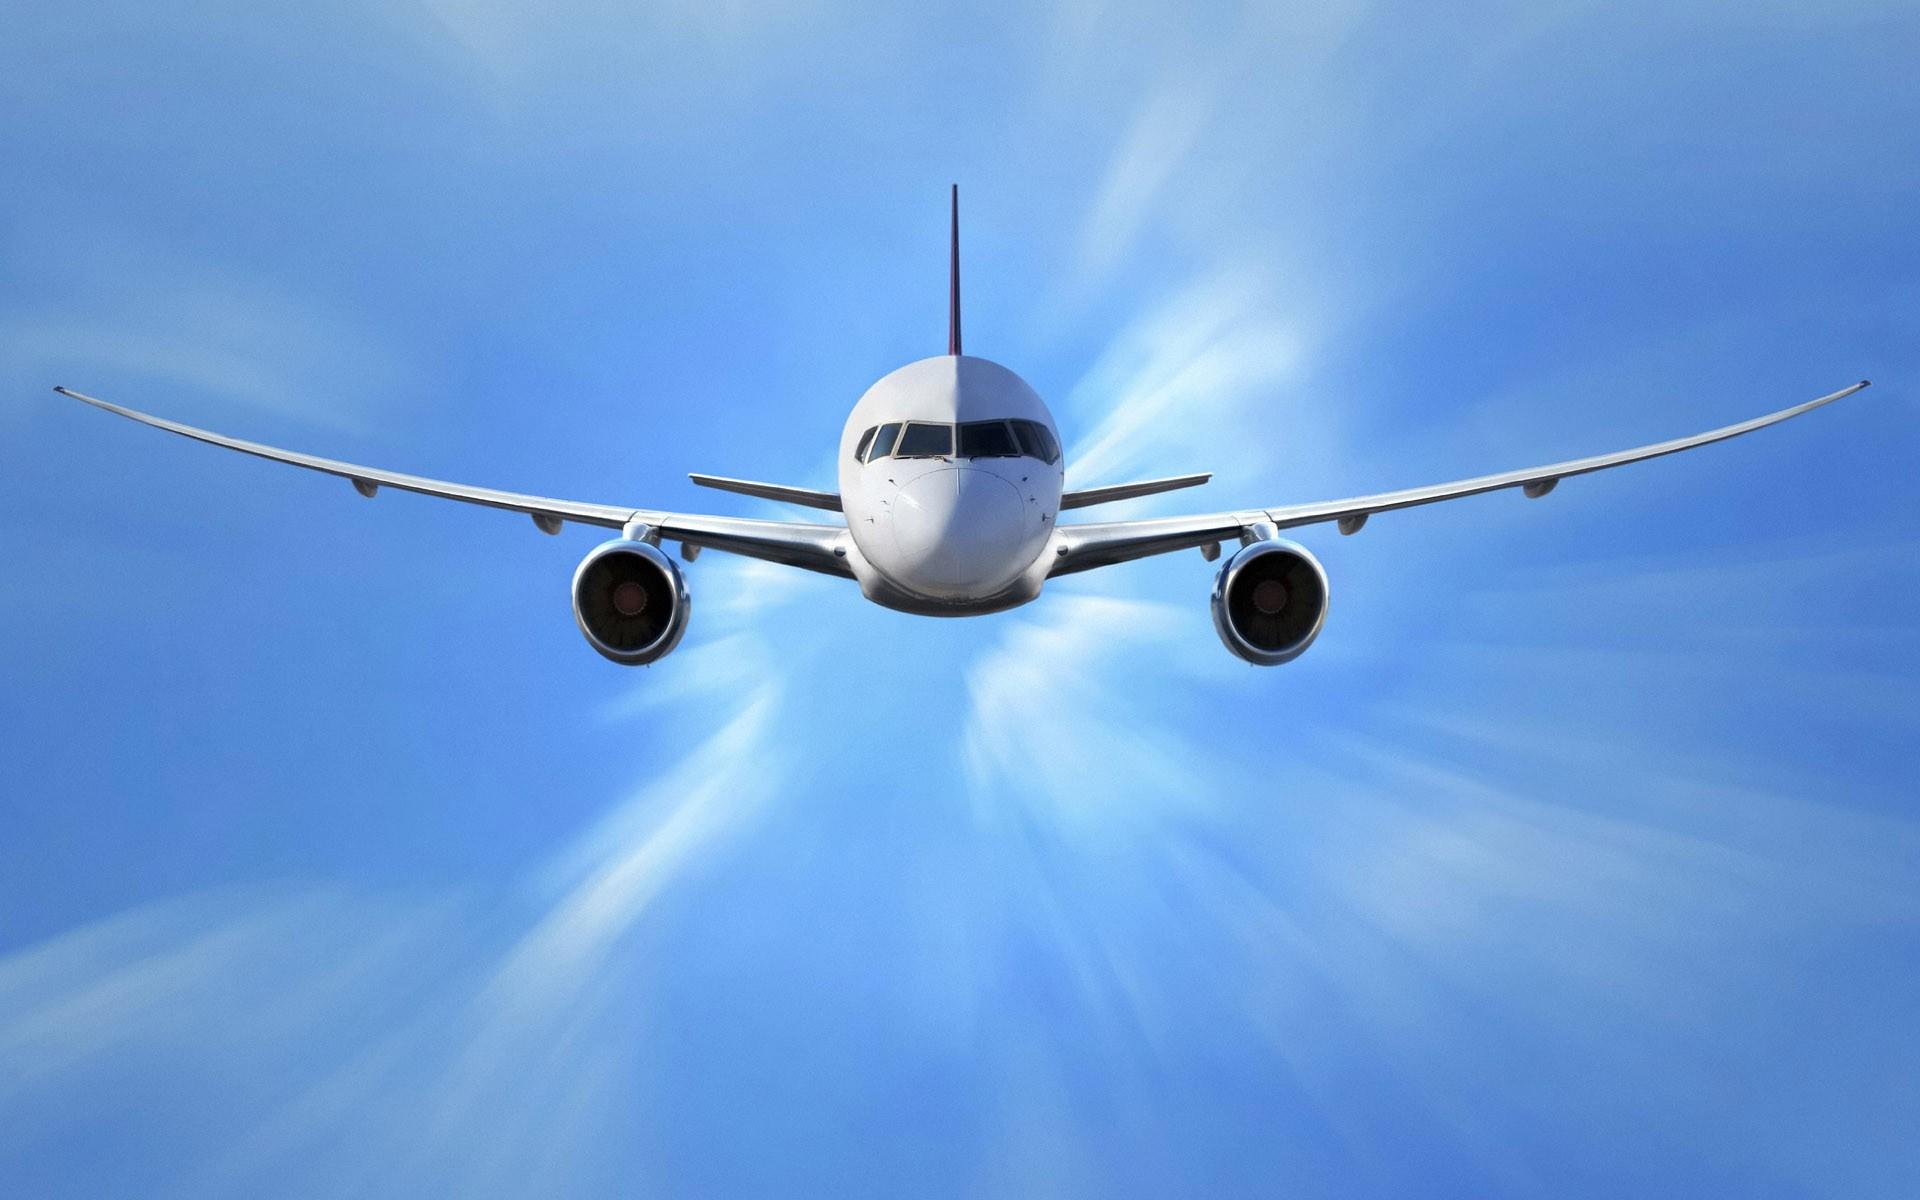 Fondox.net_un-avion-comercial-volando_1920x1200